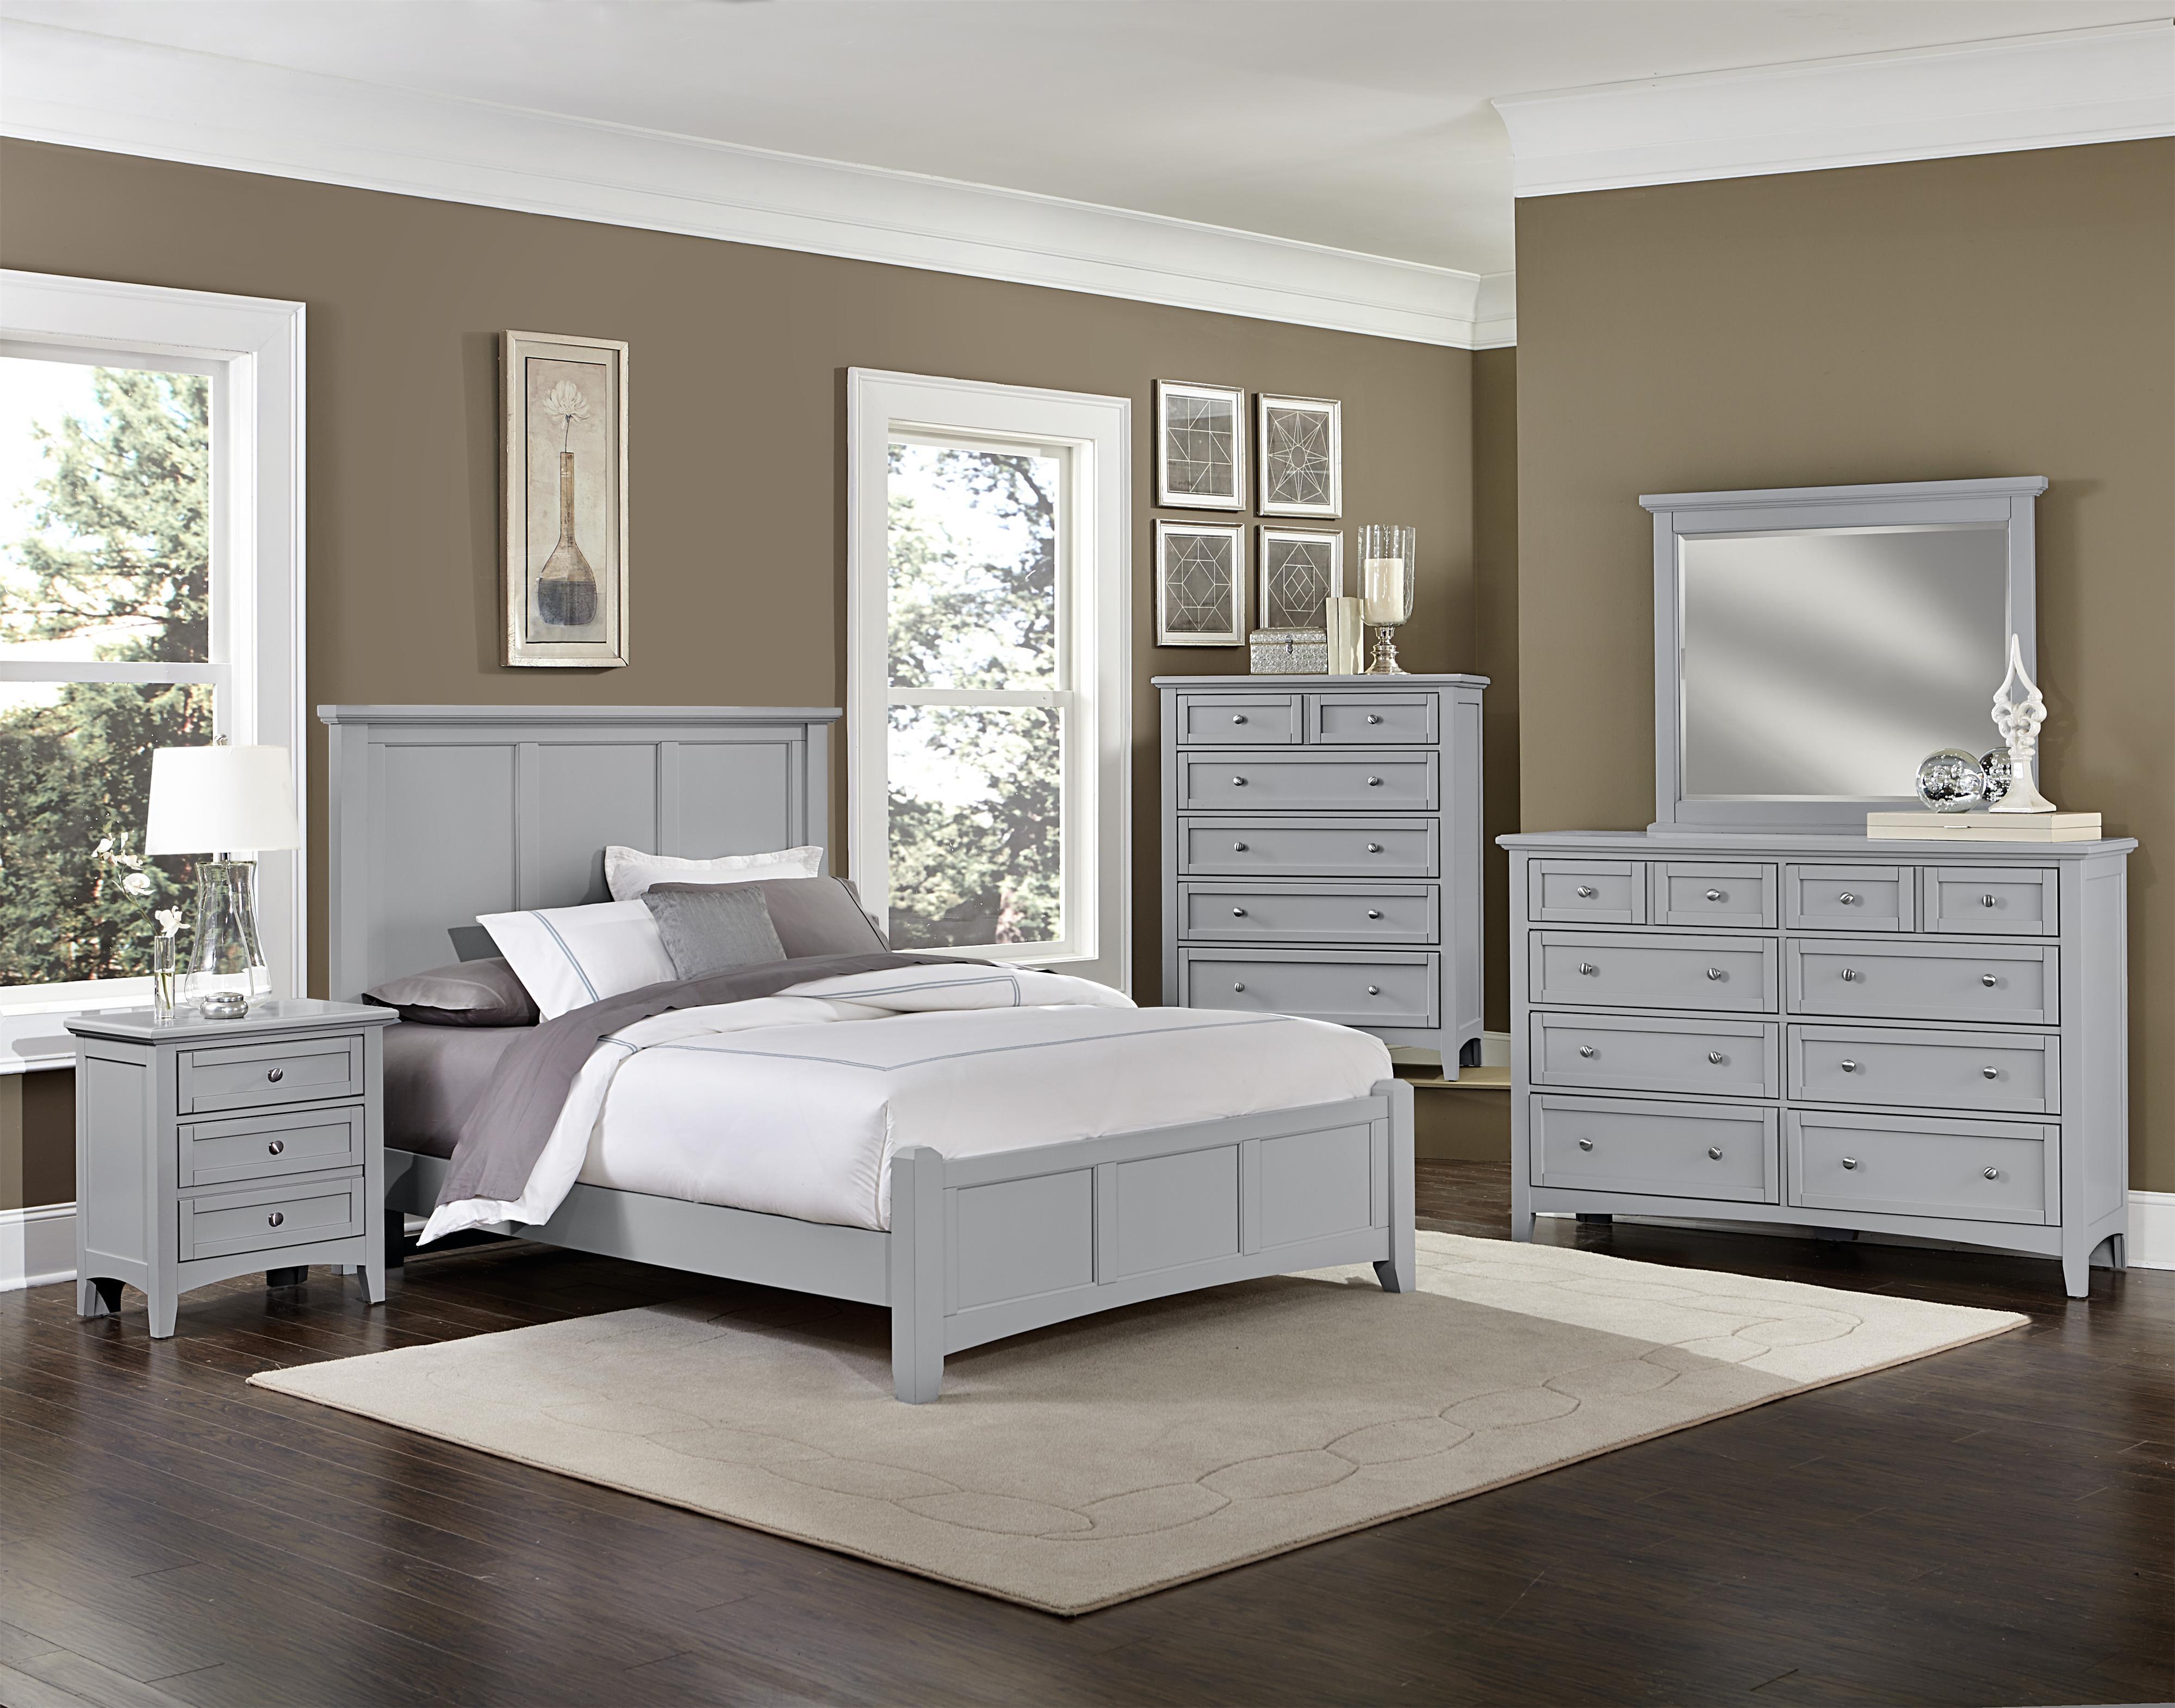 Bonanza California King Bedroom Group by Vaughan Bassett at Johnny Janosik